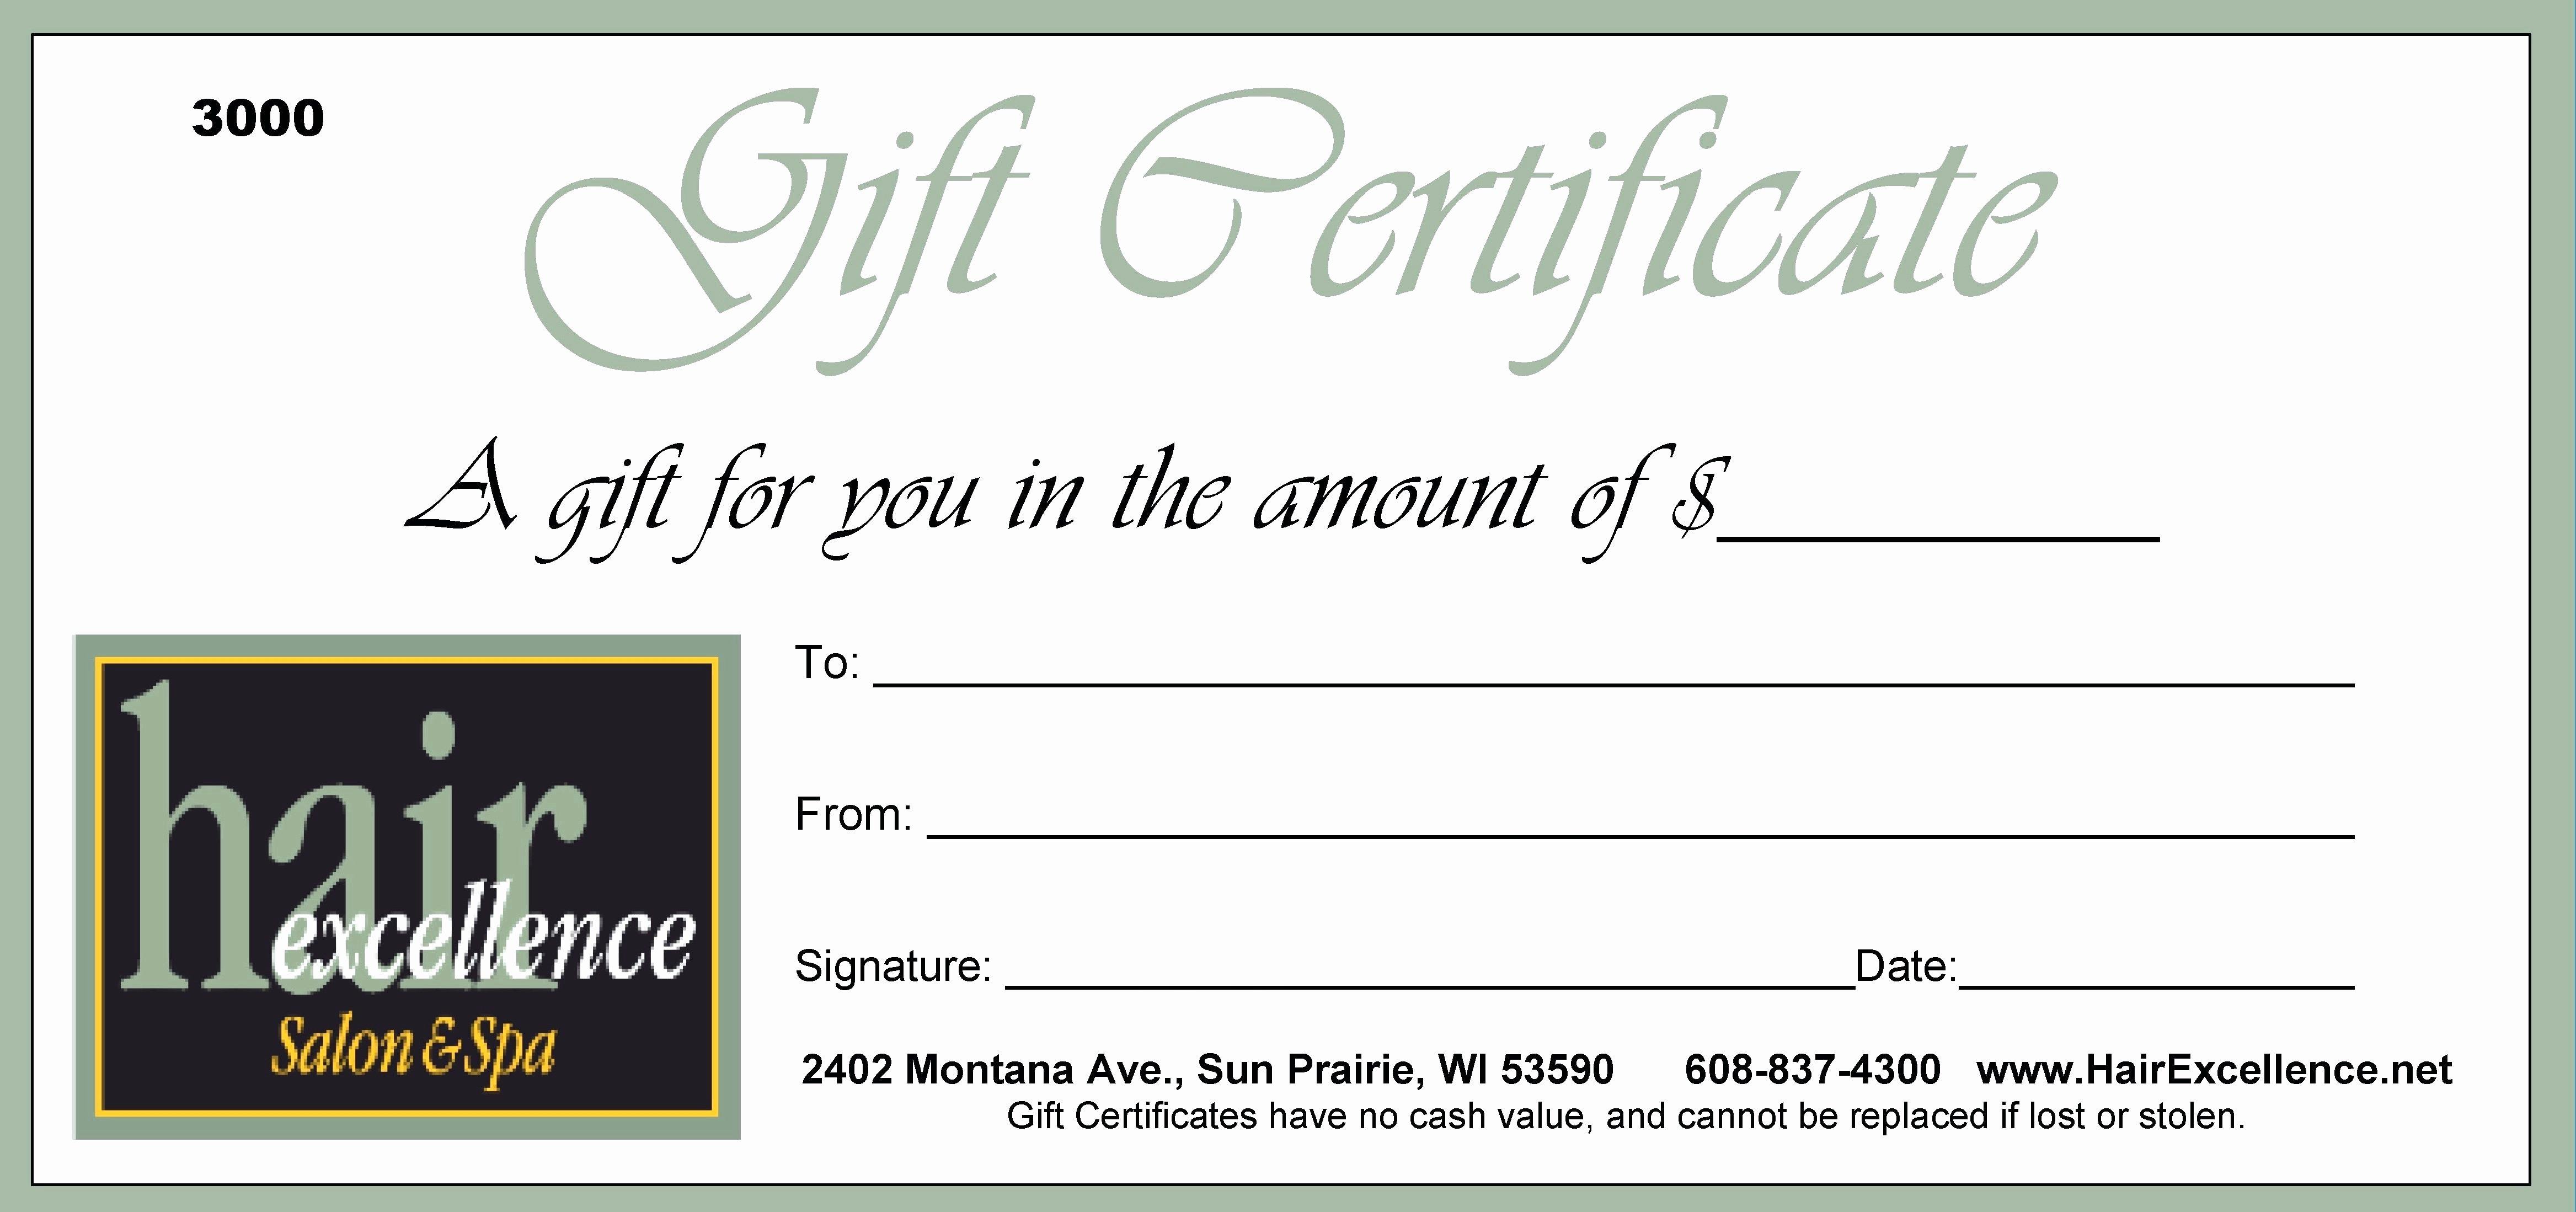 Car Wash Gift Certificate Template Fresh Car Wash T Certificate Template – Offthetrail